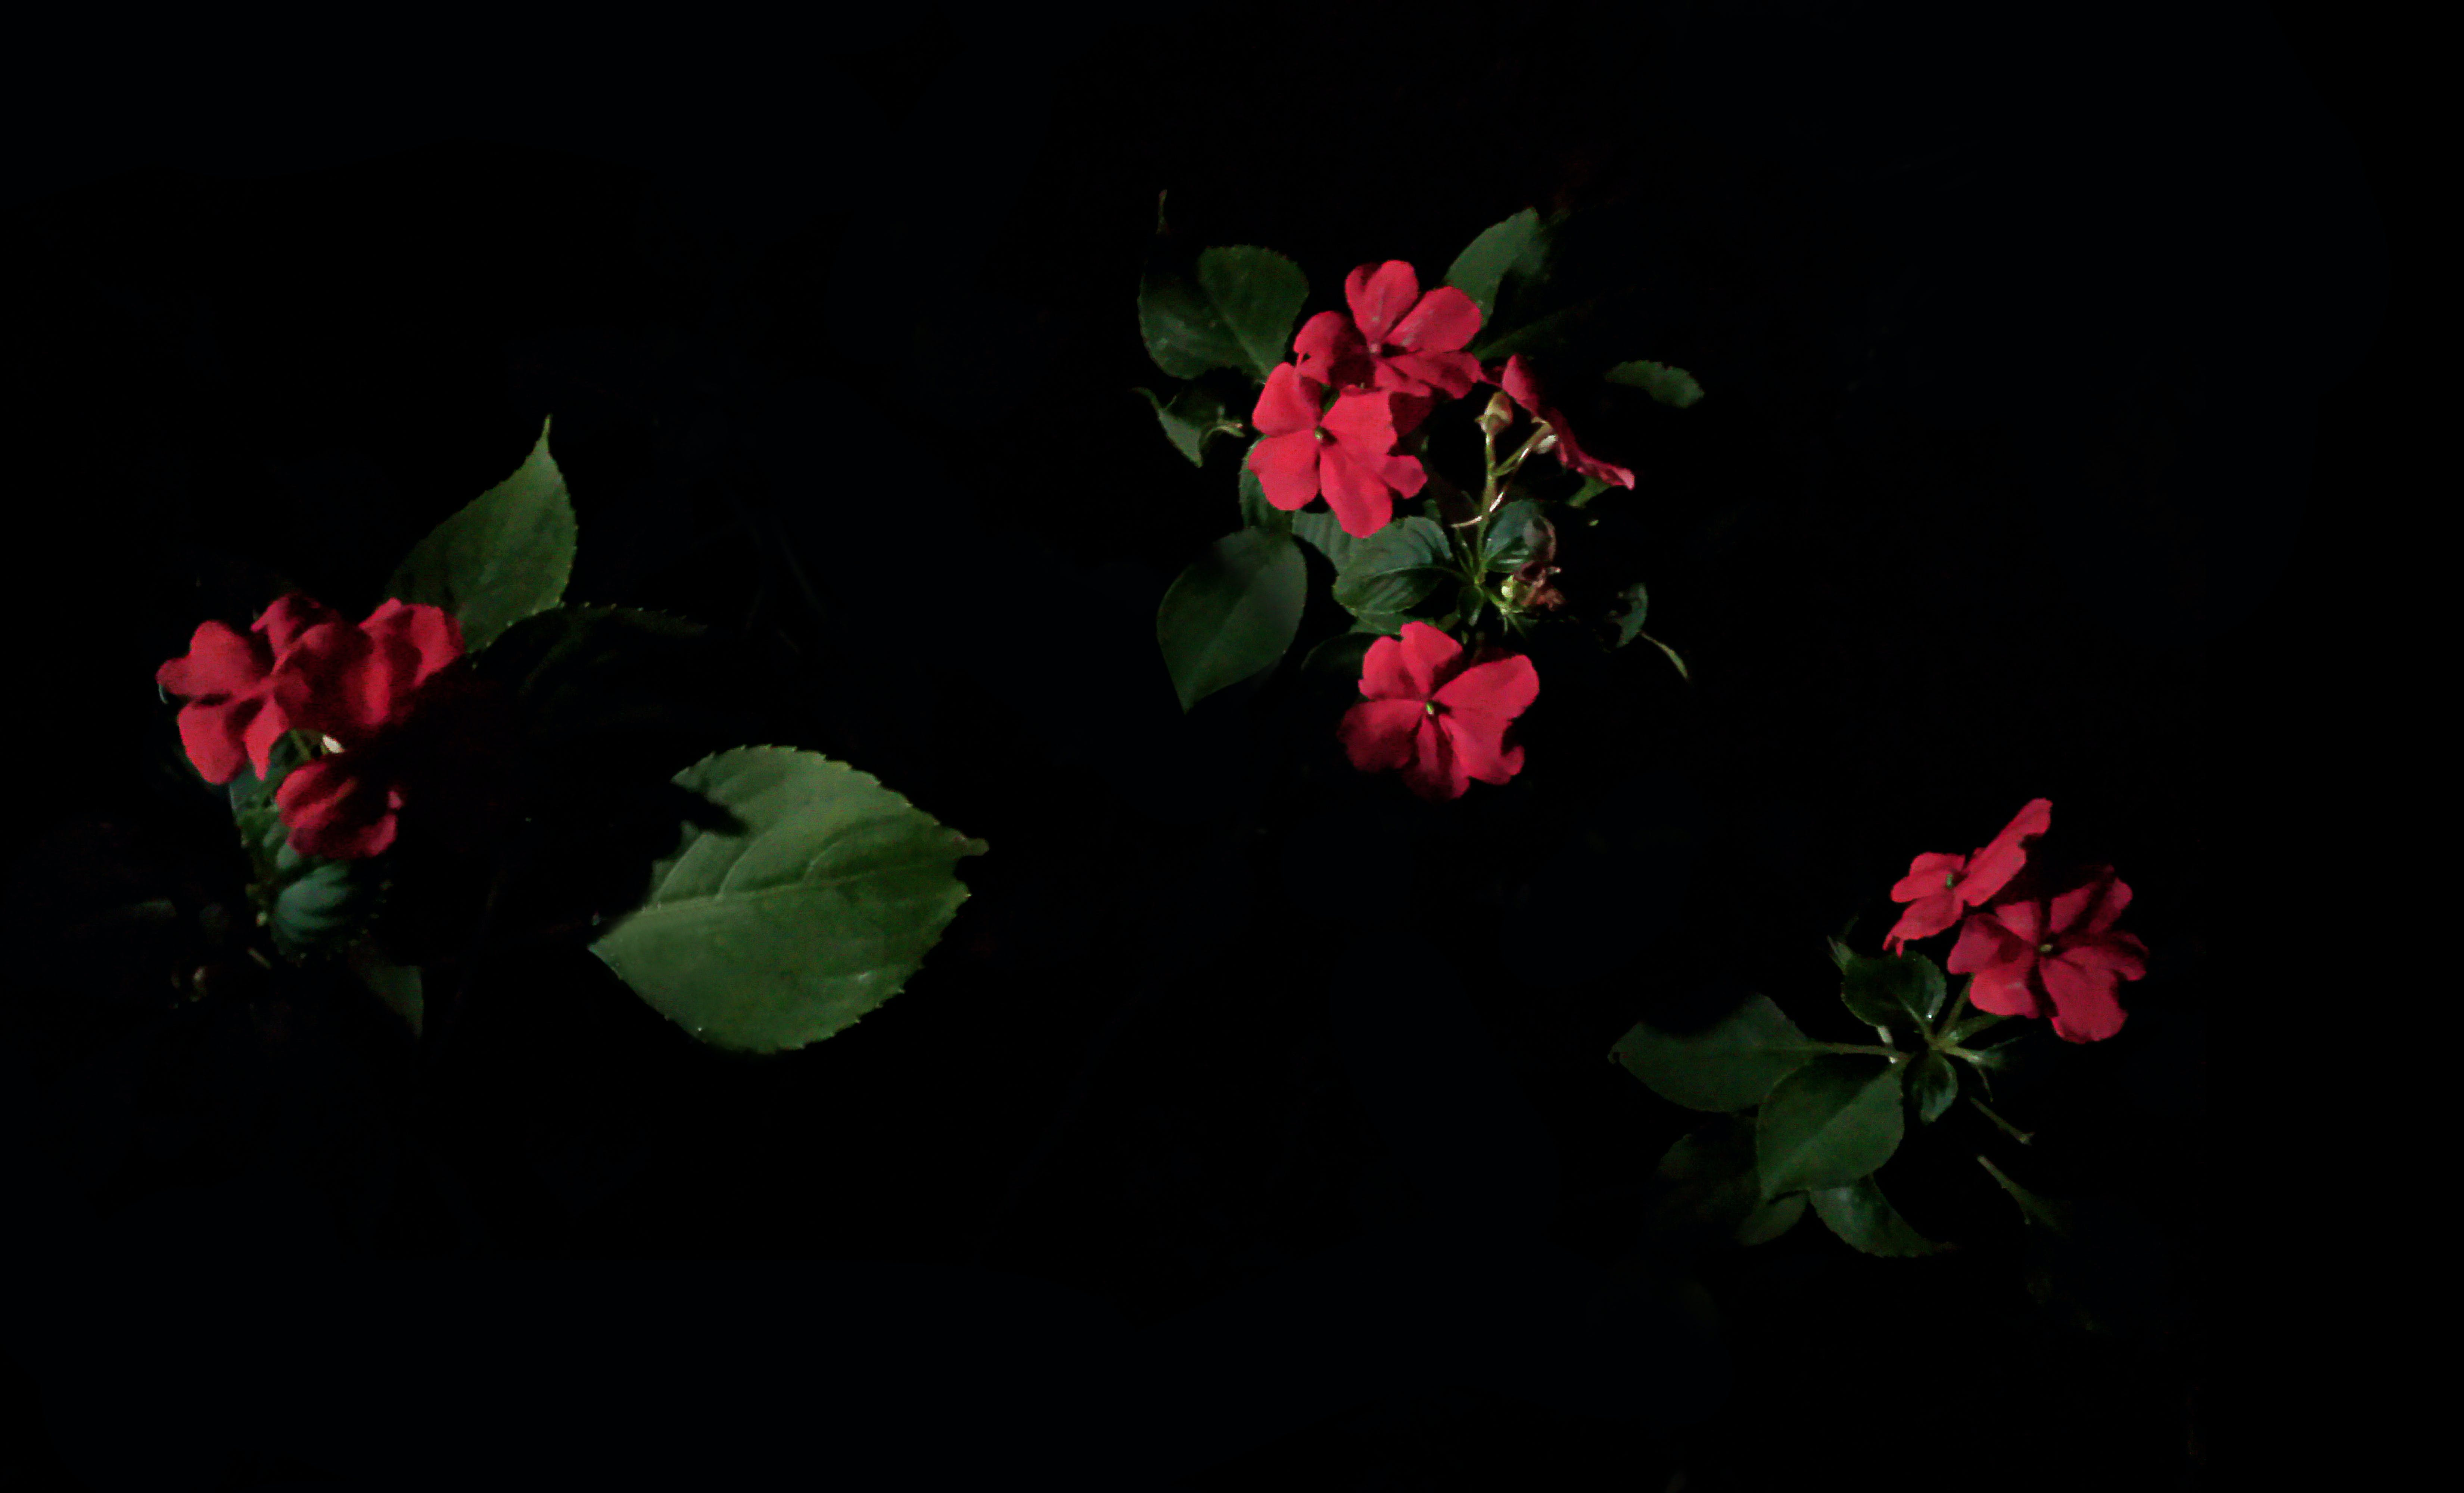 Free stock photo of beautiful flowers, black, darkness, green leaf